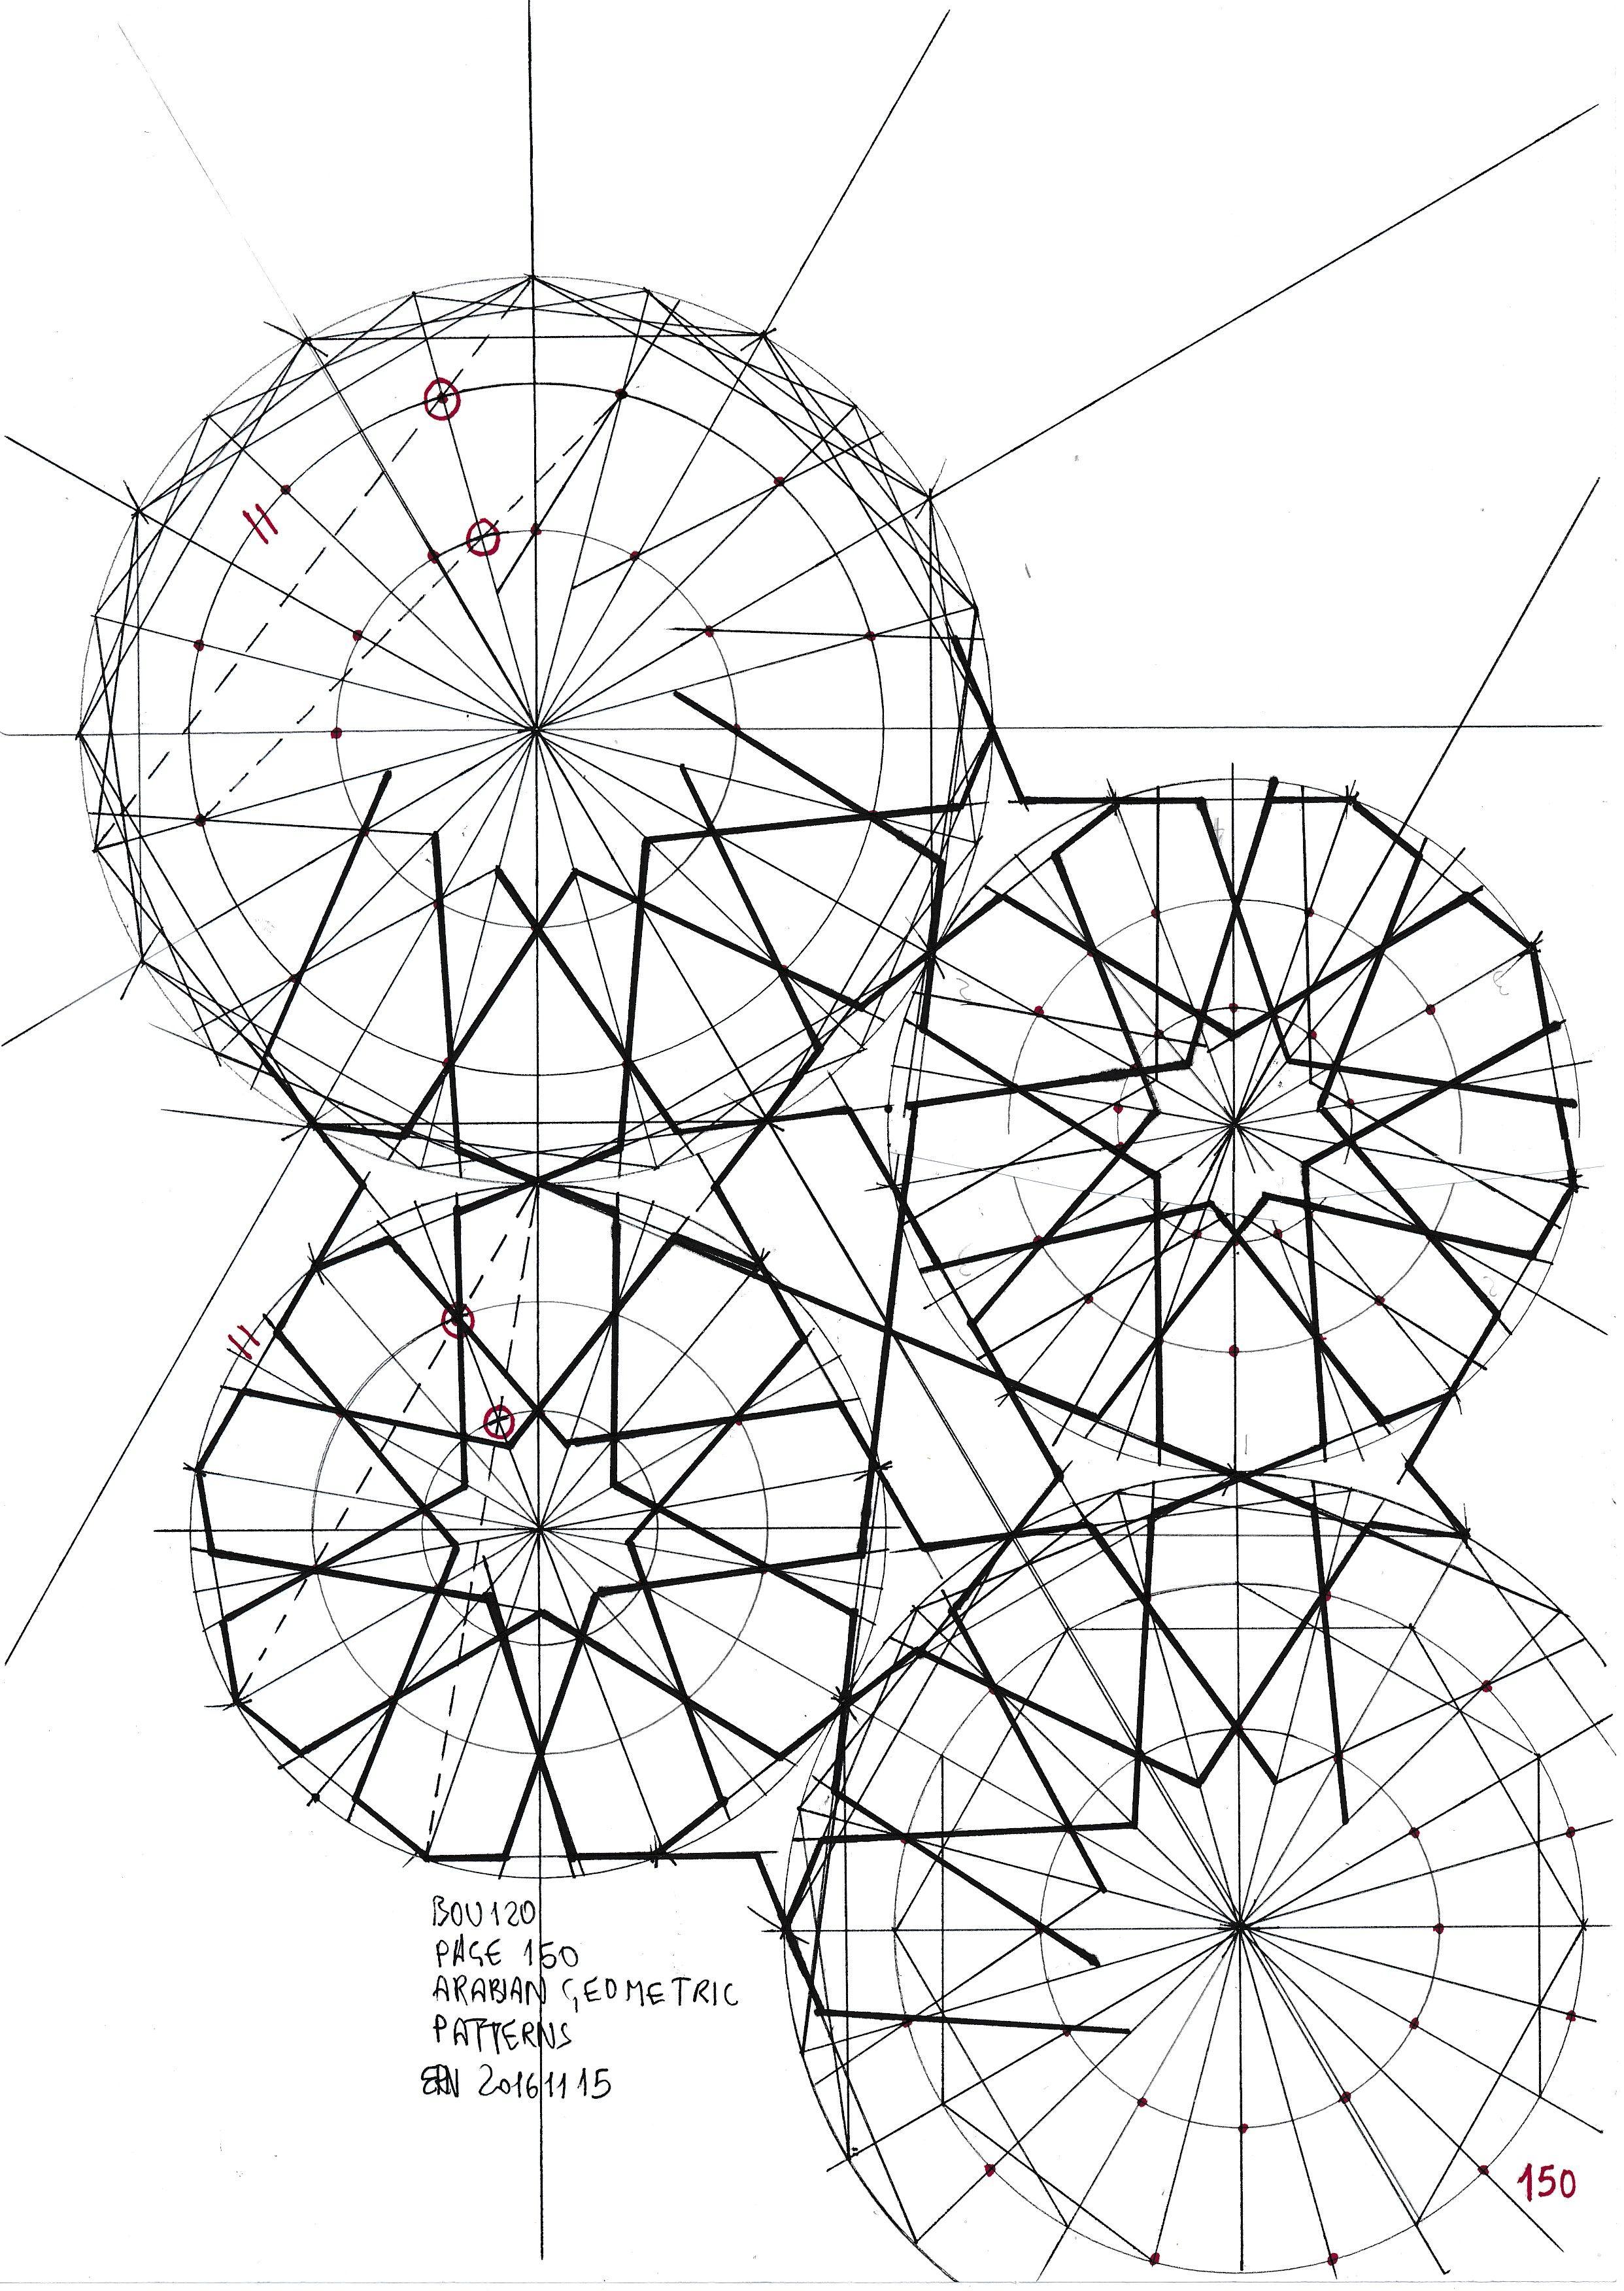 Bou120 Islamicdesign Islamicpattern Islamicart Arabiangeometry Star Pattern Mathart Regolo54 Structure Geo Geometric Drawing Geometry Art Pattern Art